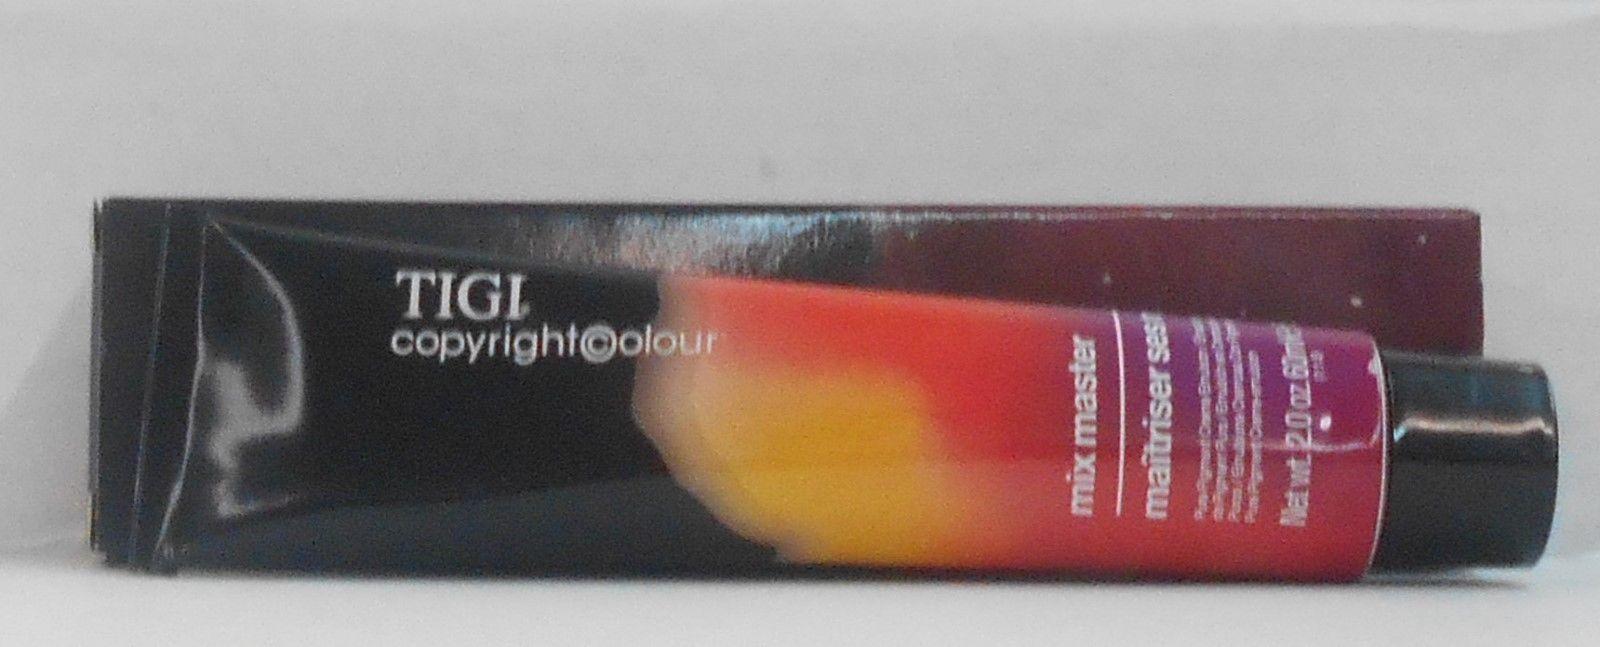 New Pkg TIGI MIX MASTER Pure Pigment Professional Permanent Hair Colour  2.0 oz!